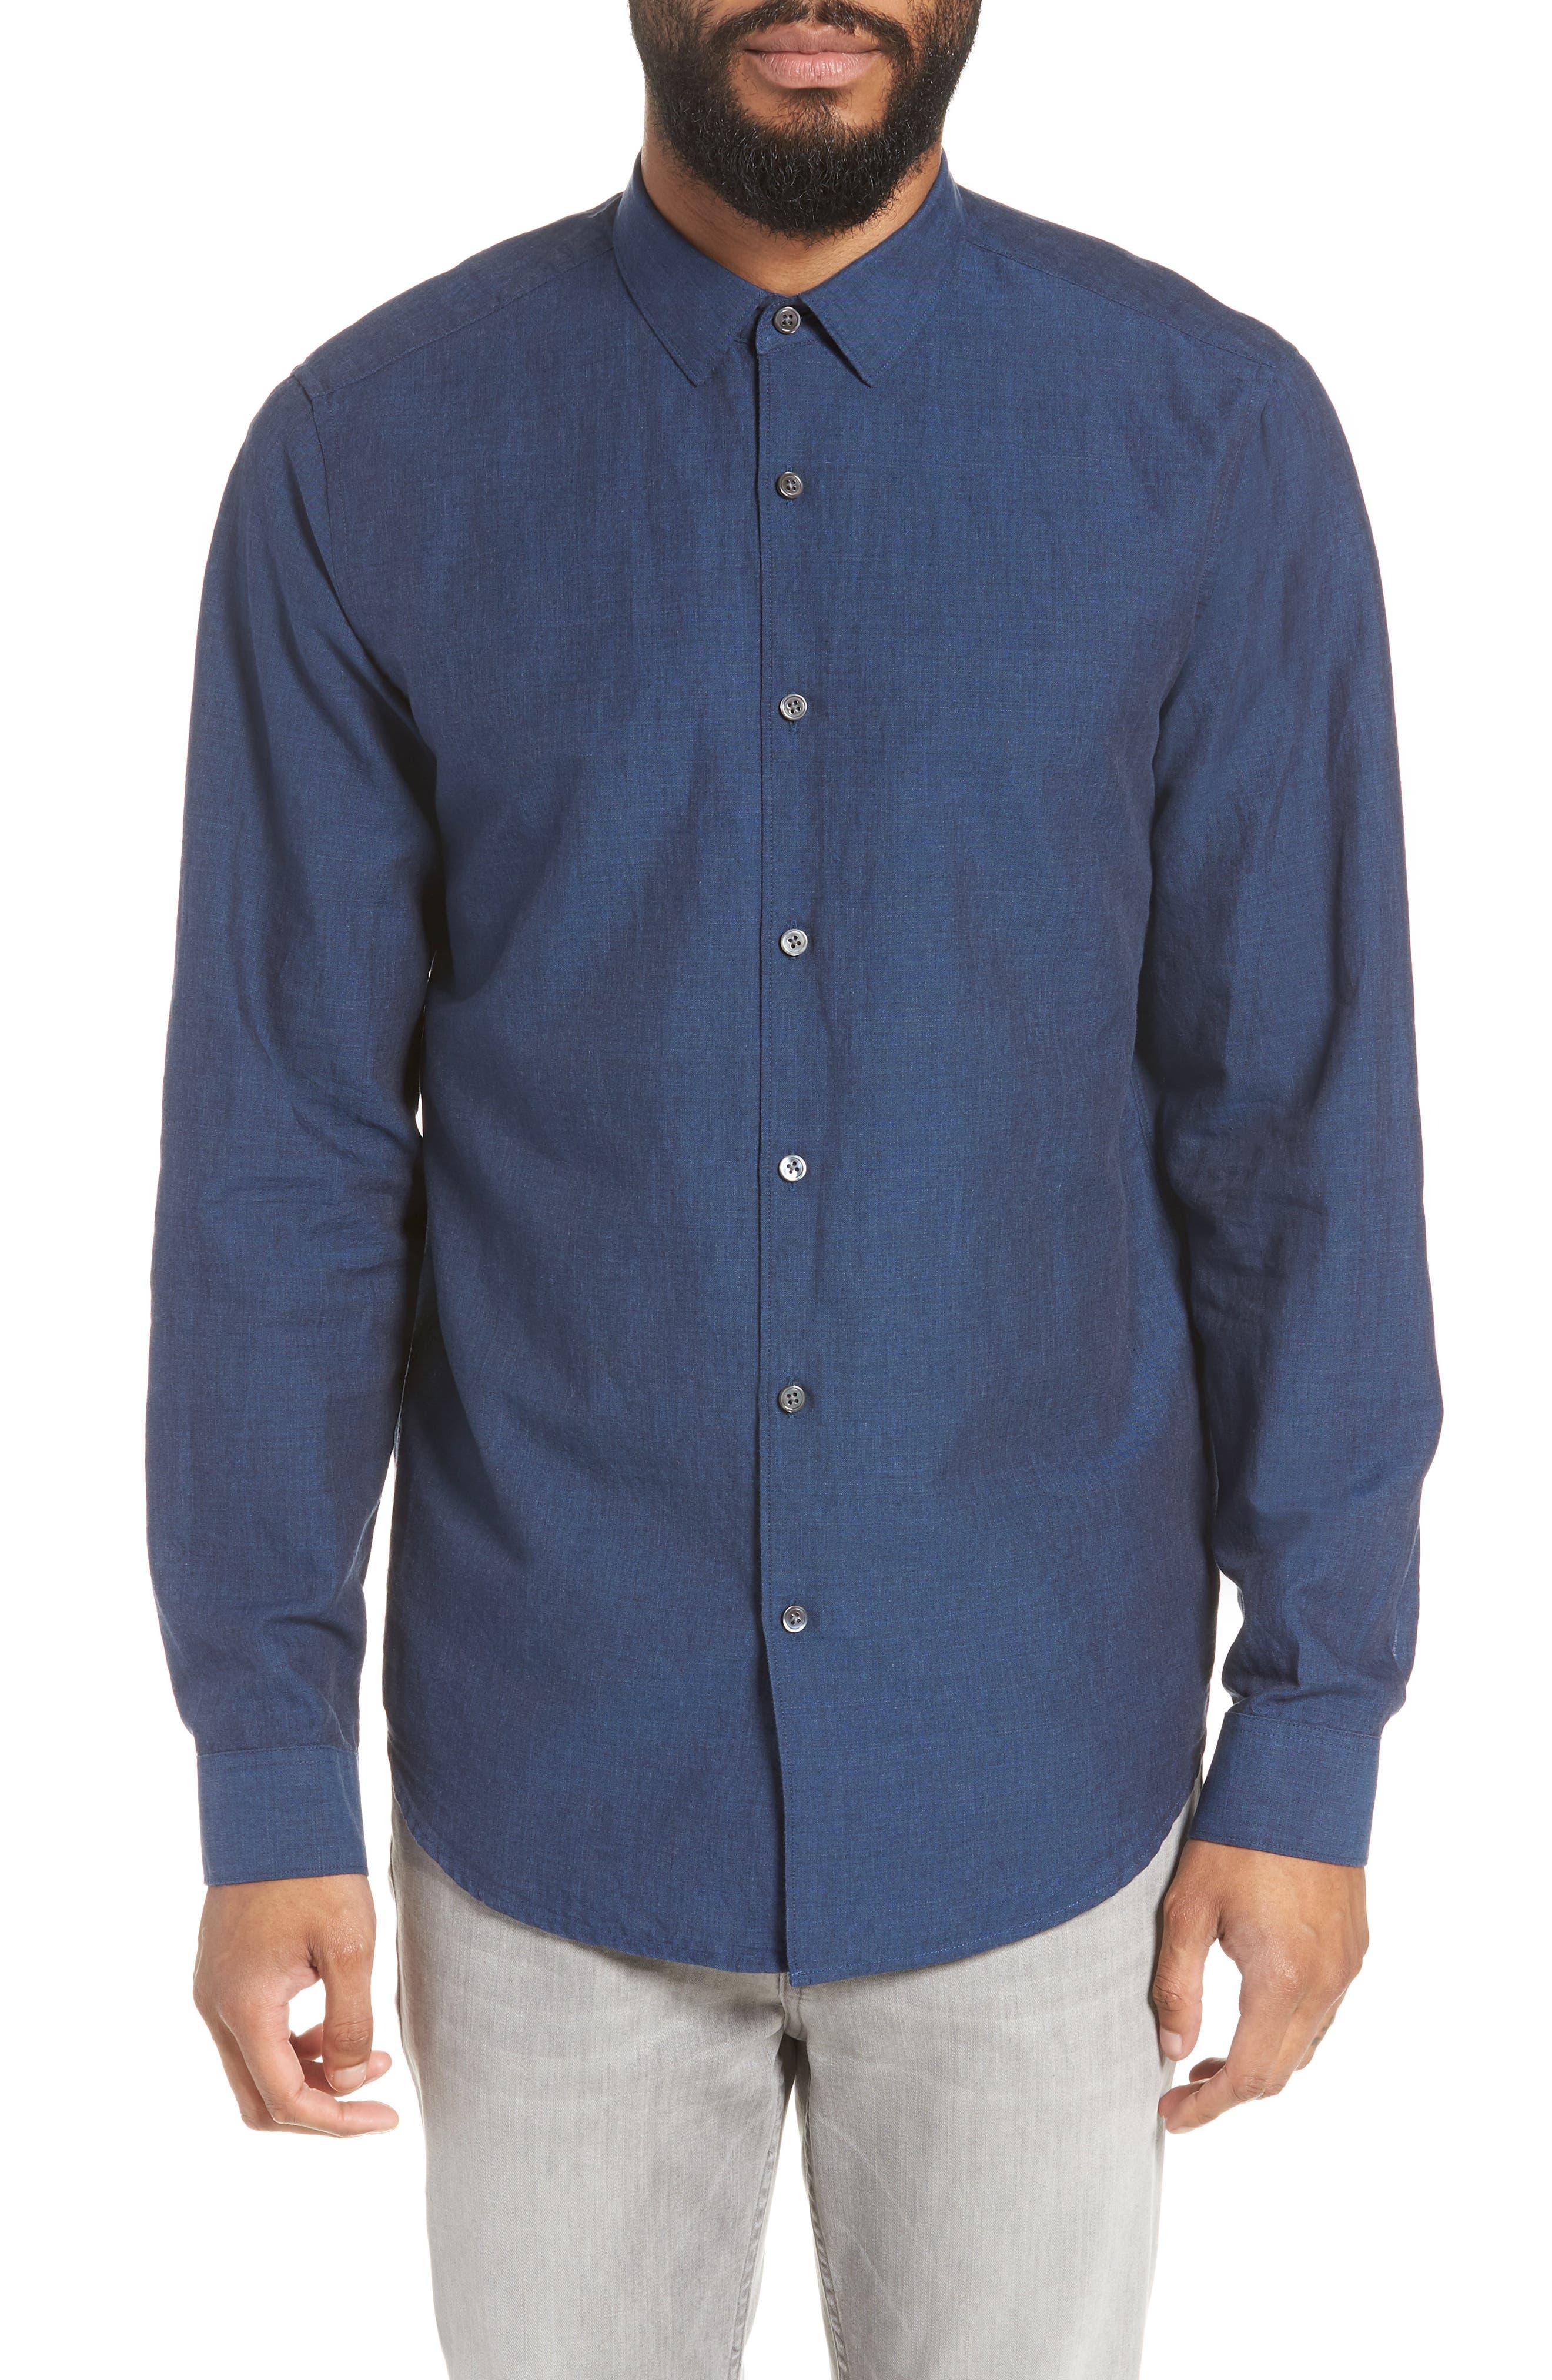 Murrary Indy Regular Fit Solid Cotton & Linen Sport Shirt,                             Main thumbnail 1, color,                             FINCH